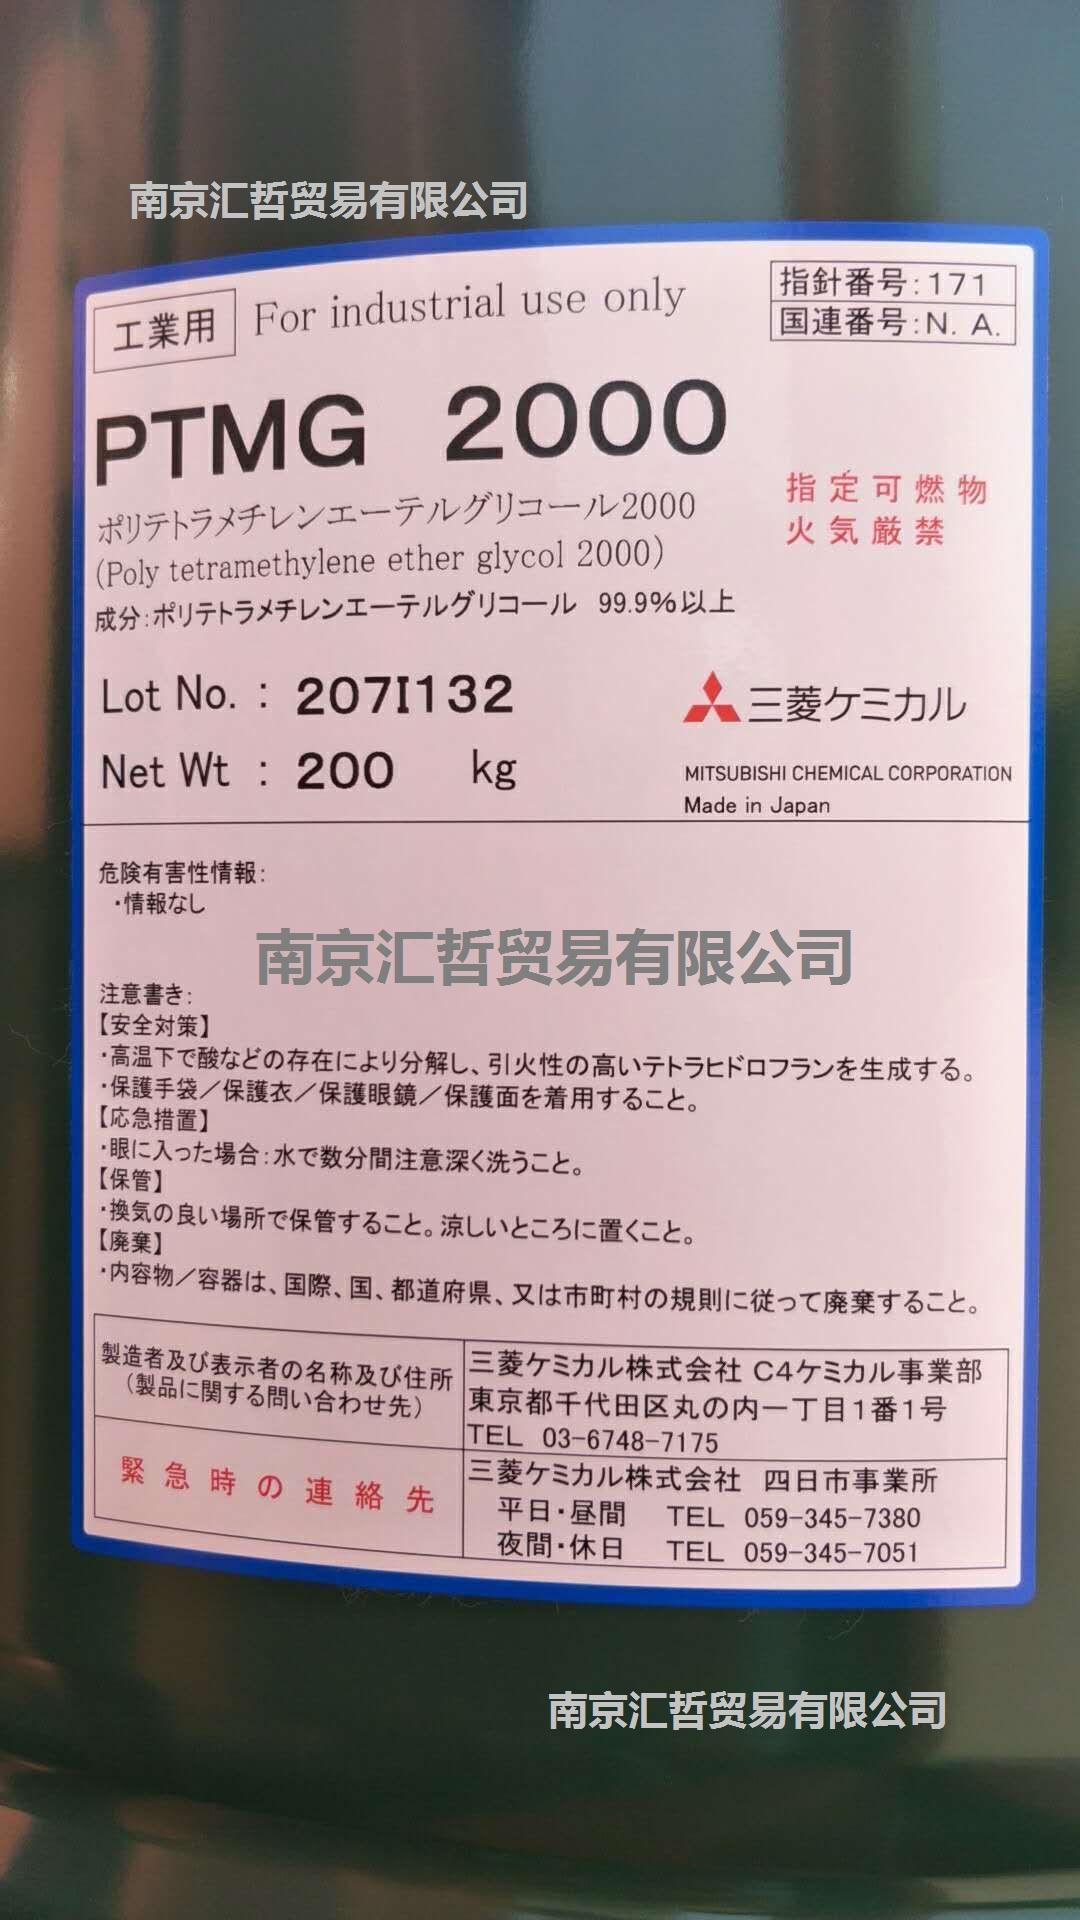 PTMG2000